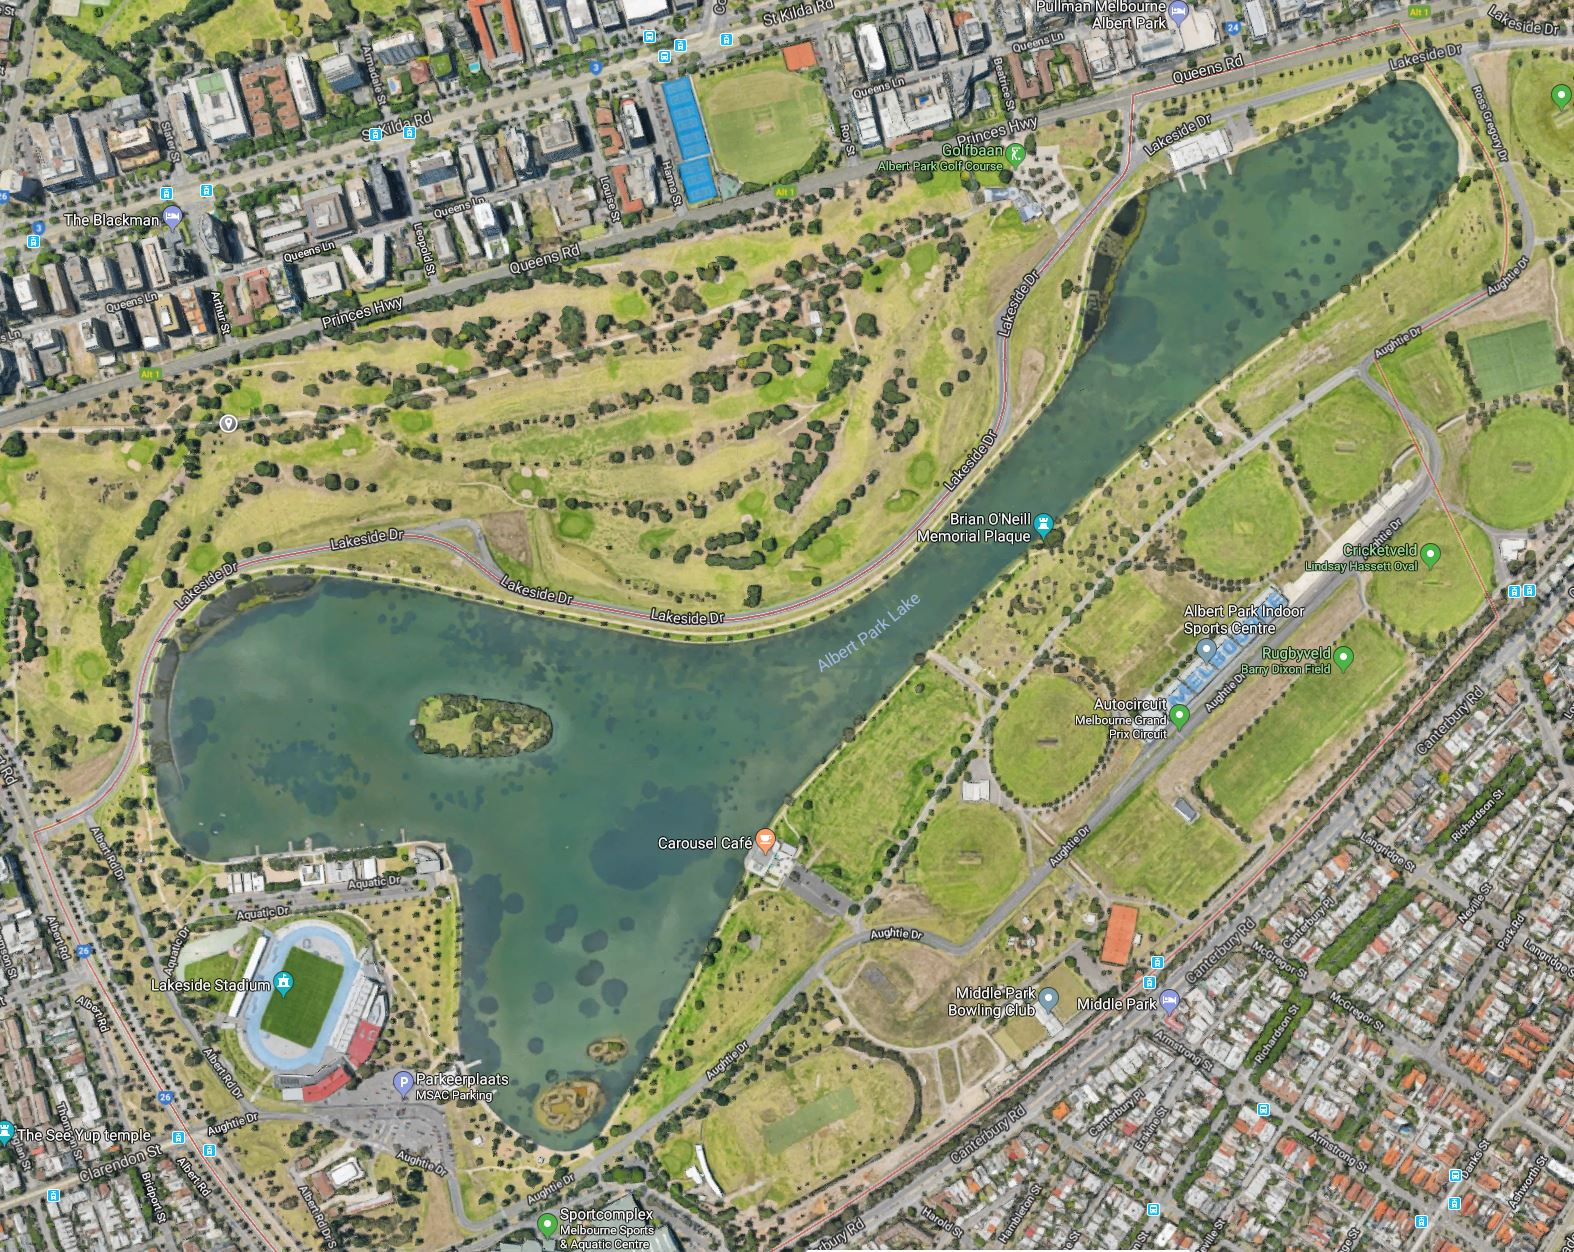 Australian F1 grand prix circuit